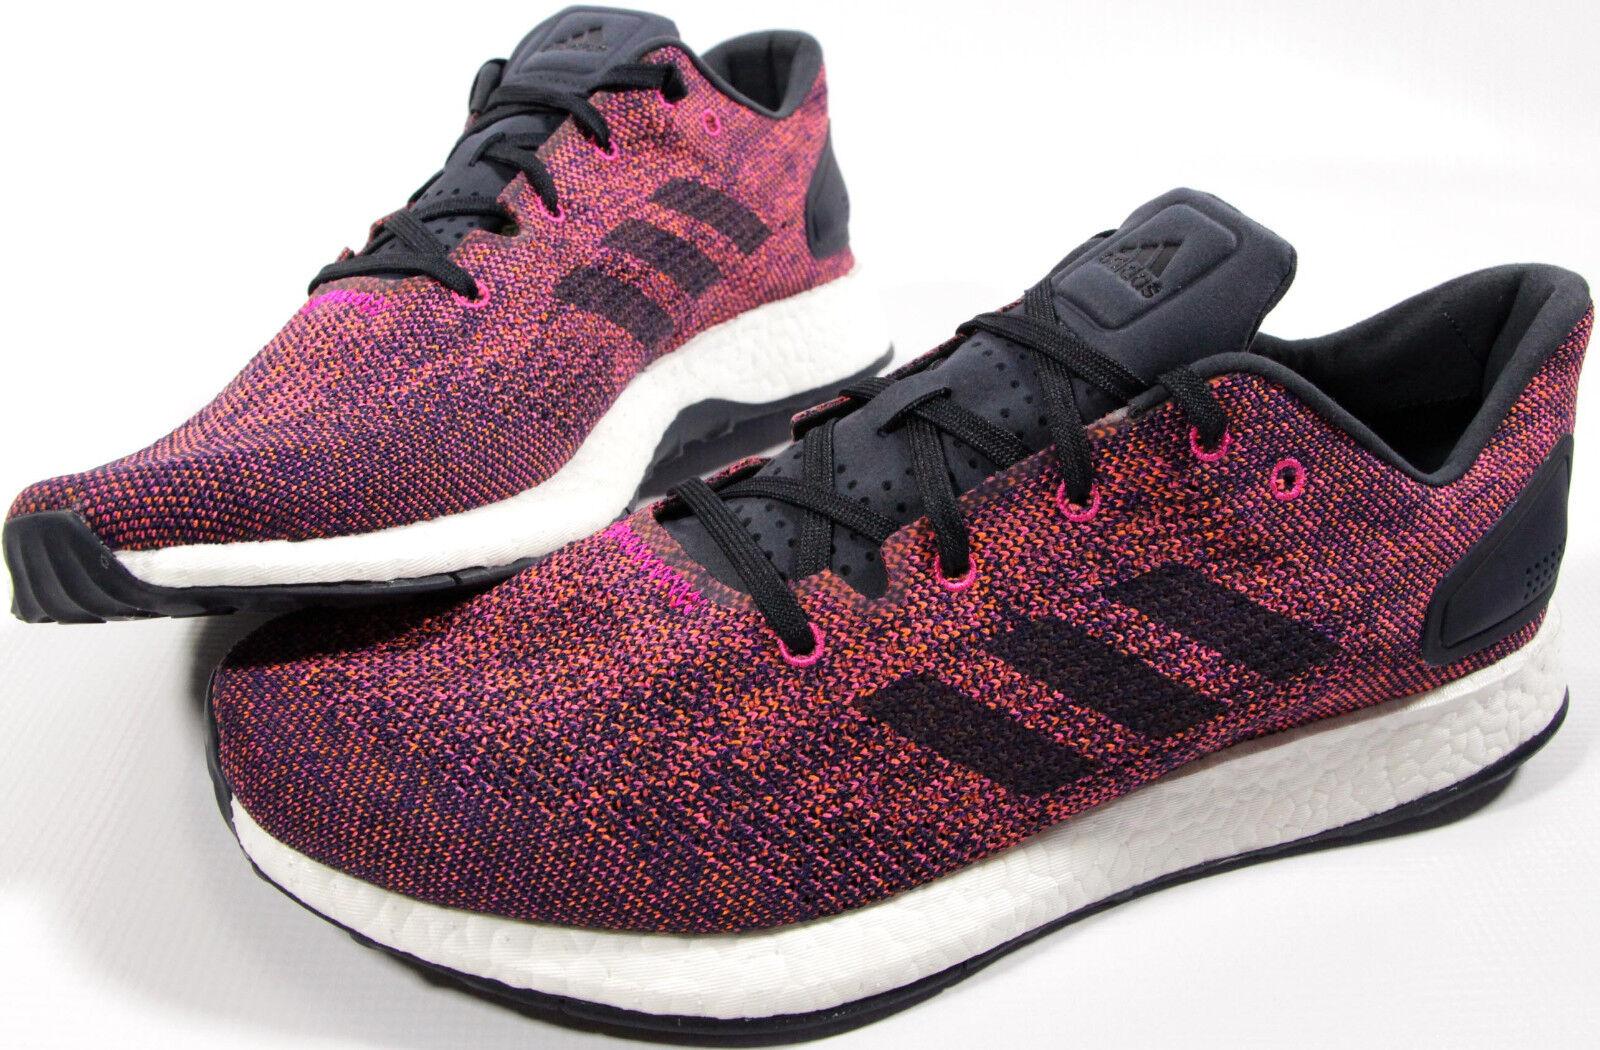 ADIDAS PureBOOST DPR Running shoes- 11- NEW-mens Boost light knit sneaker-  150